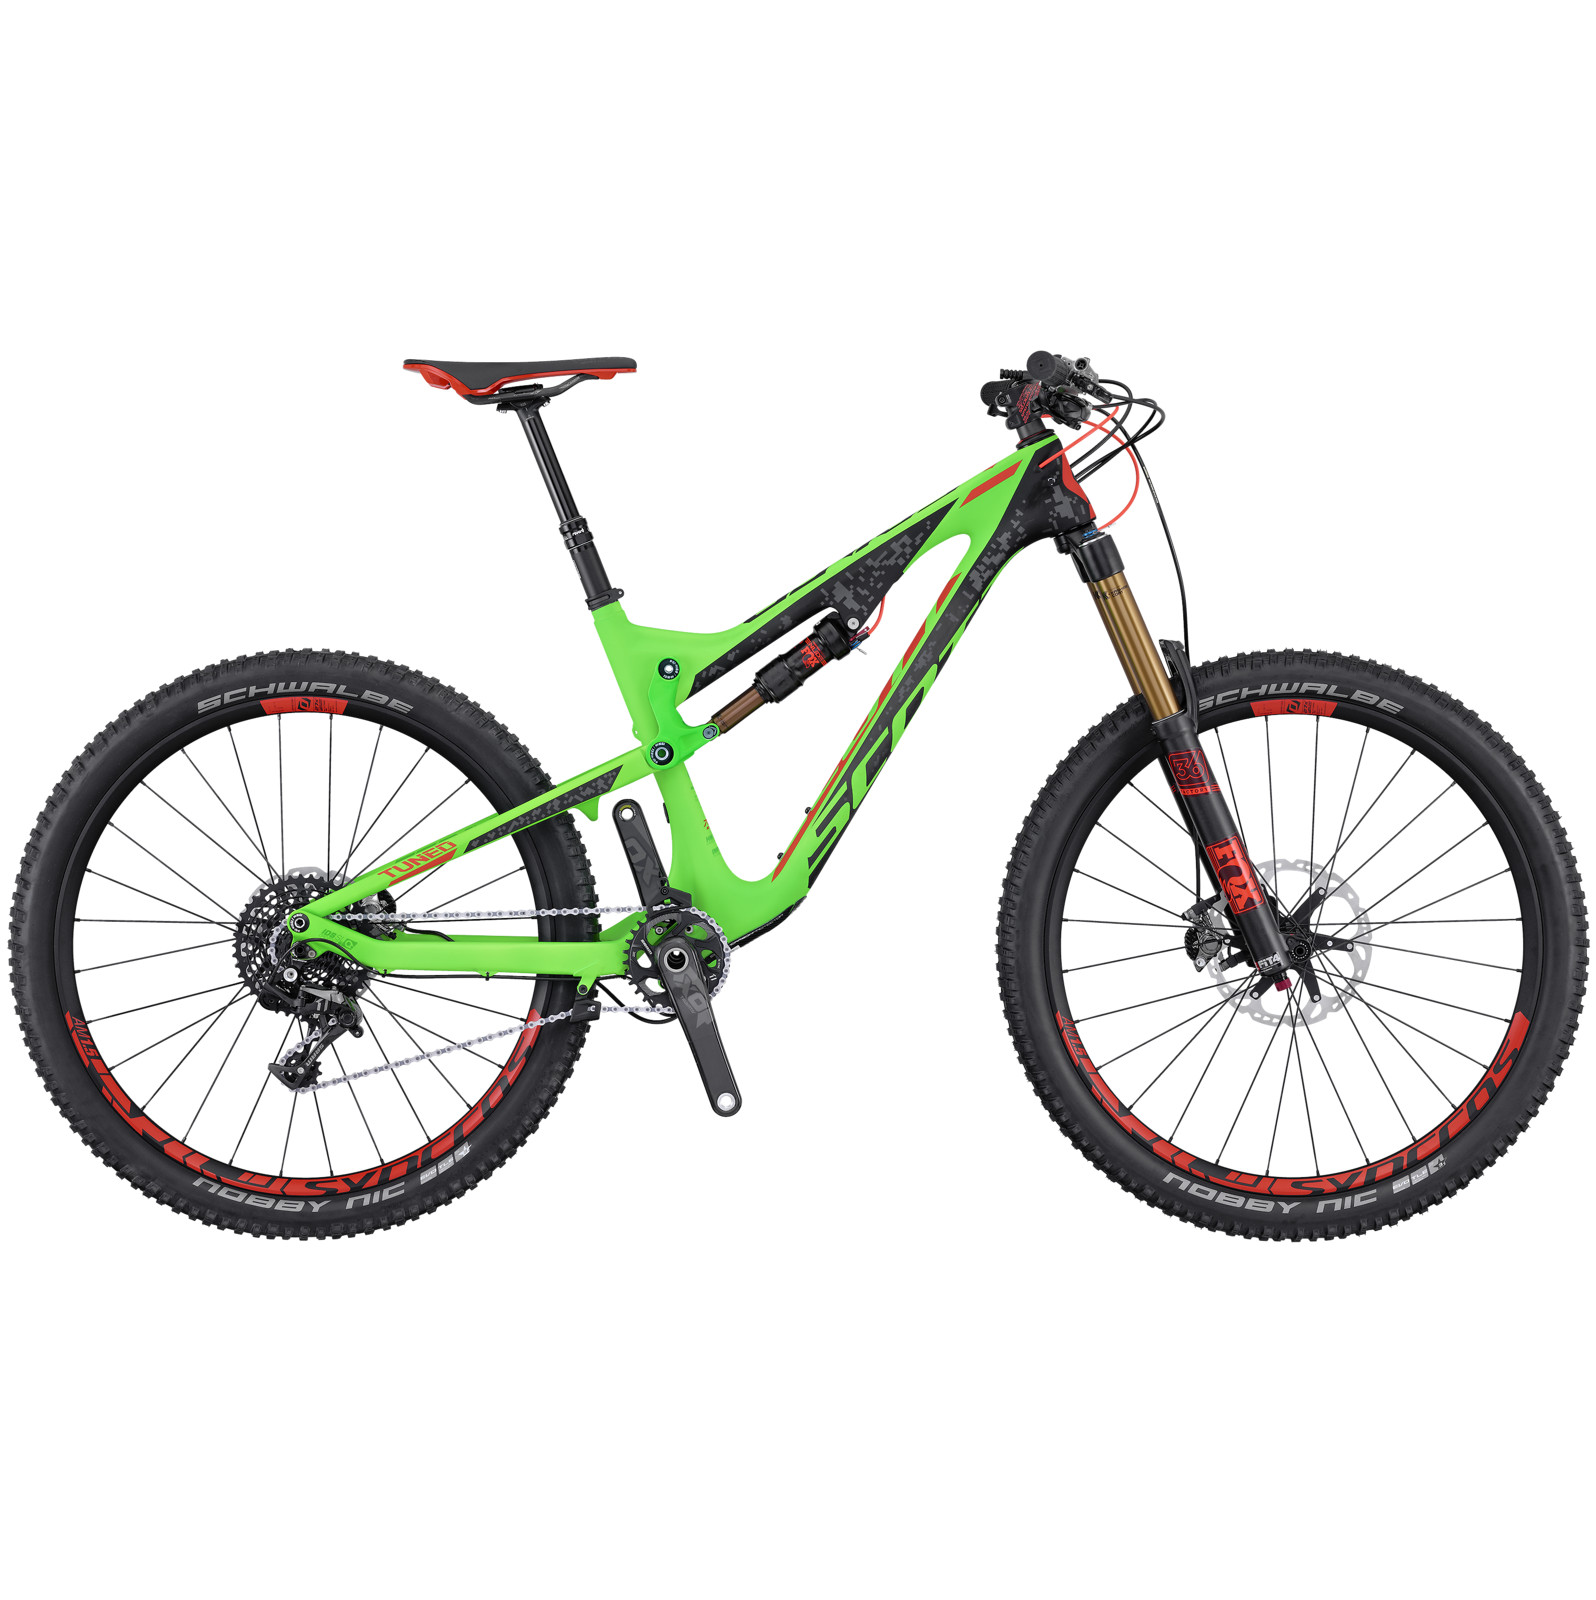 ac618d9690b 2016 Scott Genius LT 700 Tuned Bike - Reviews, Comparisons, Specs ...